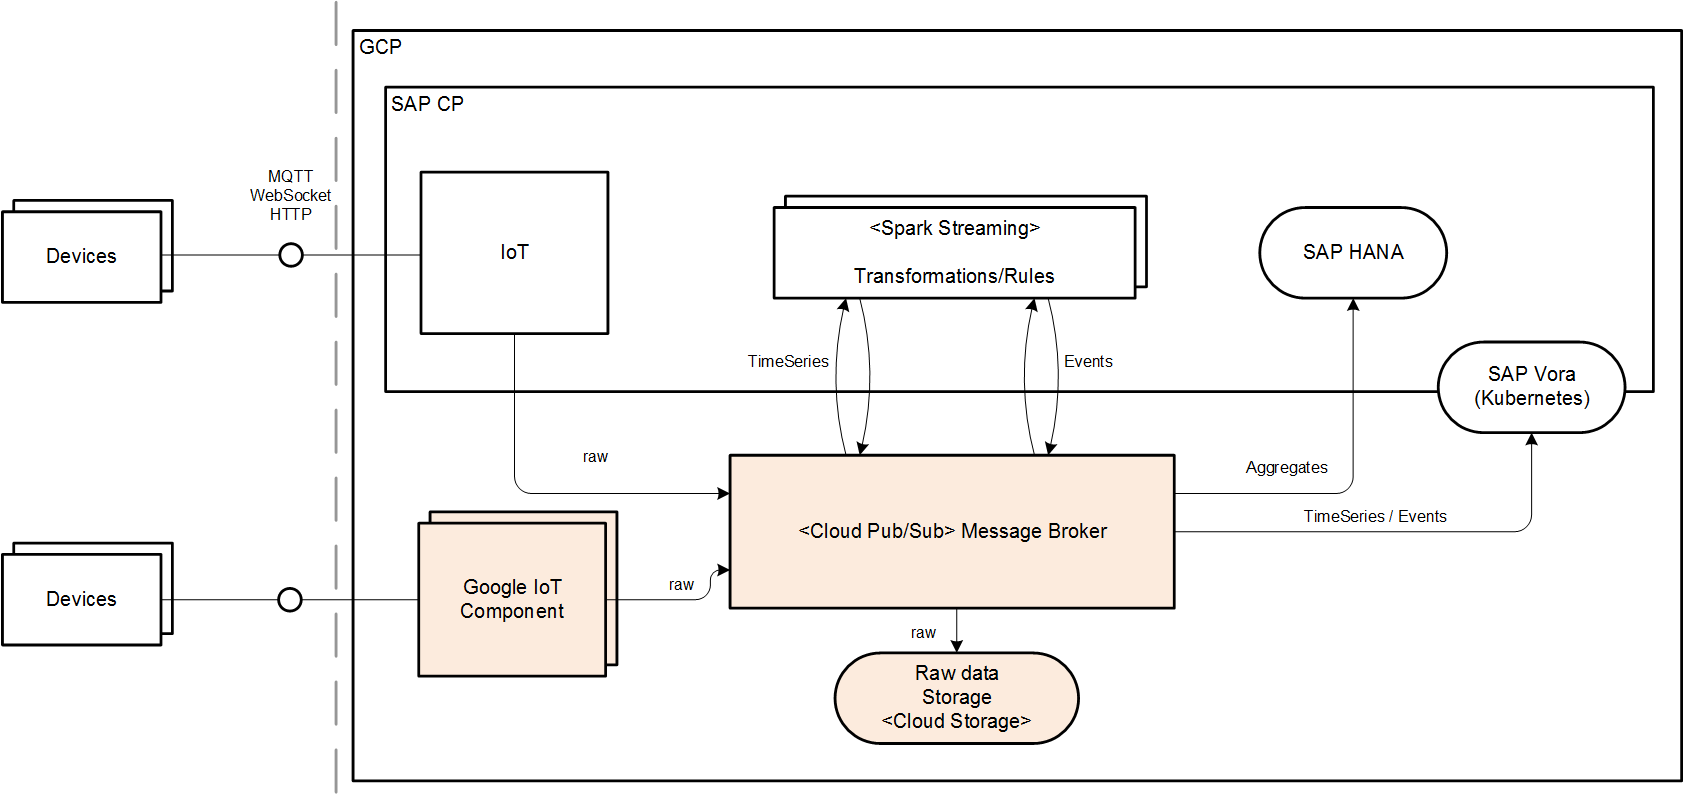 SAP Leonardo Internet of Things (IoT) runs on Google Cloud Platform